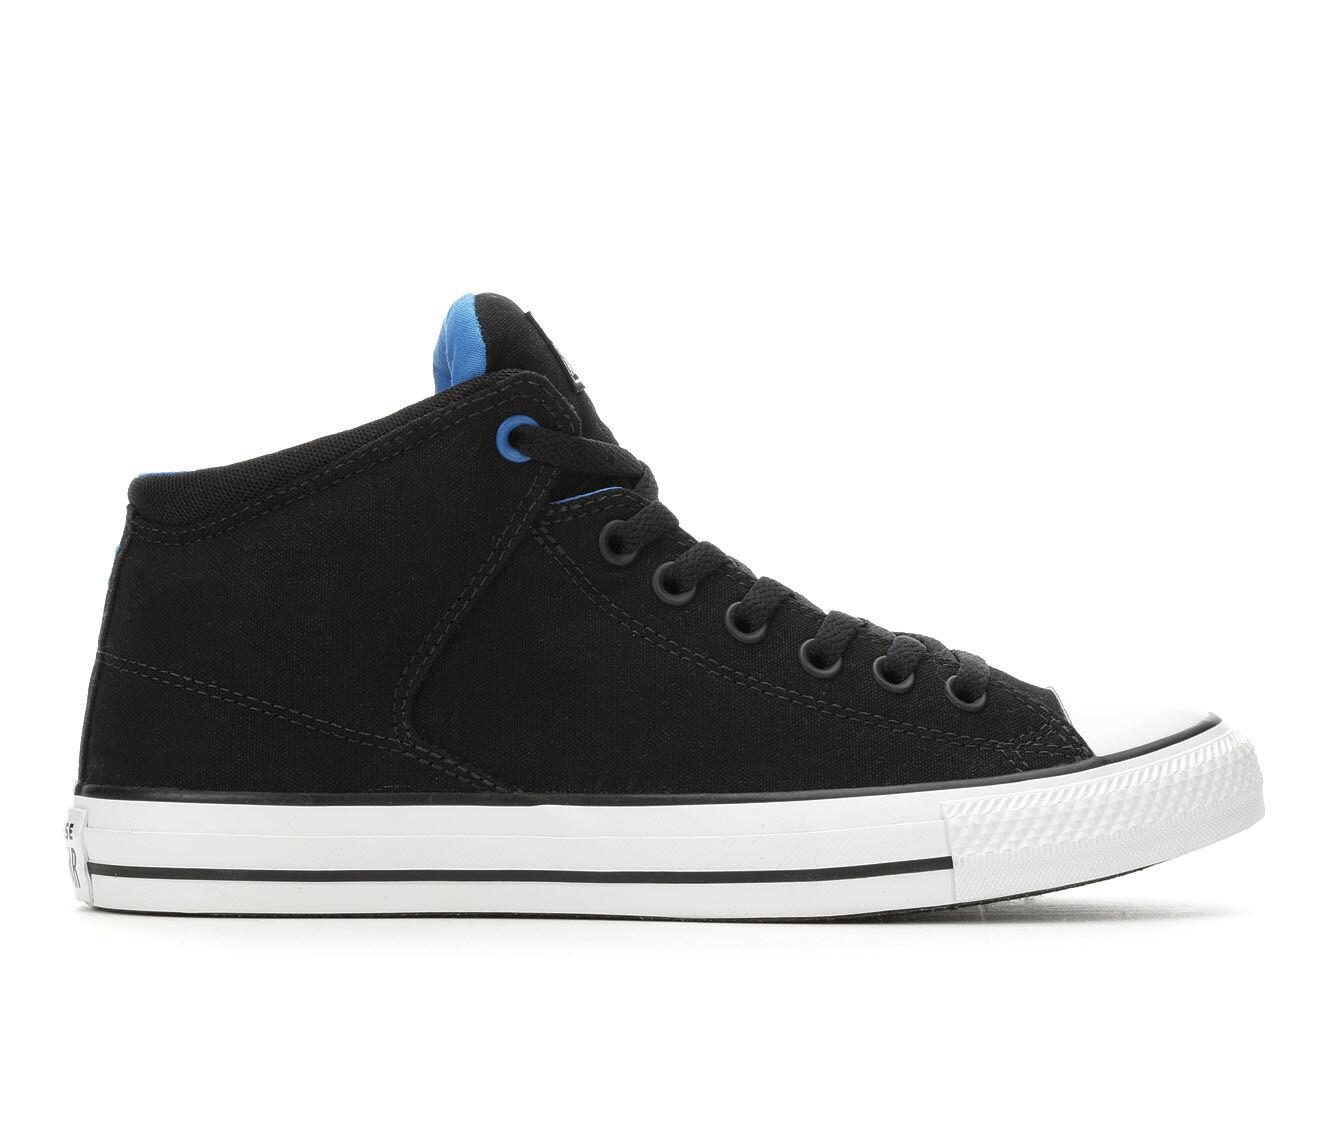 uk shoes_kd4353